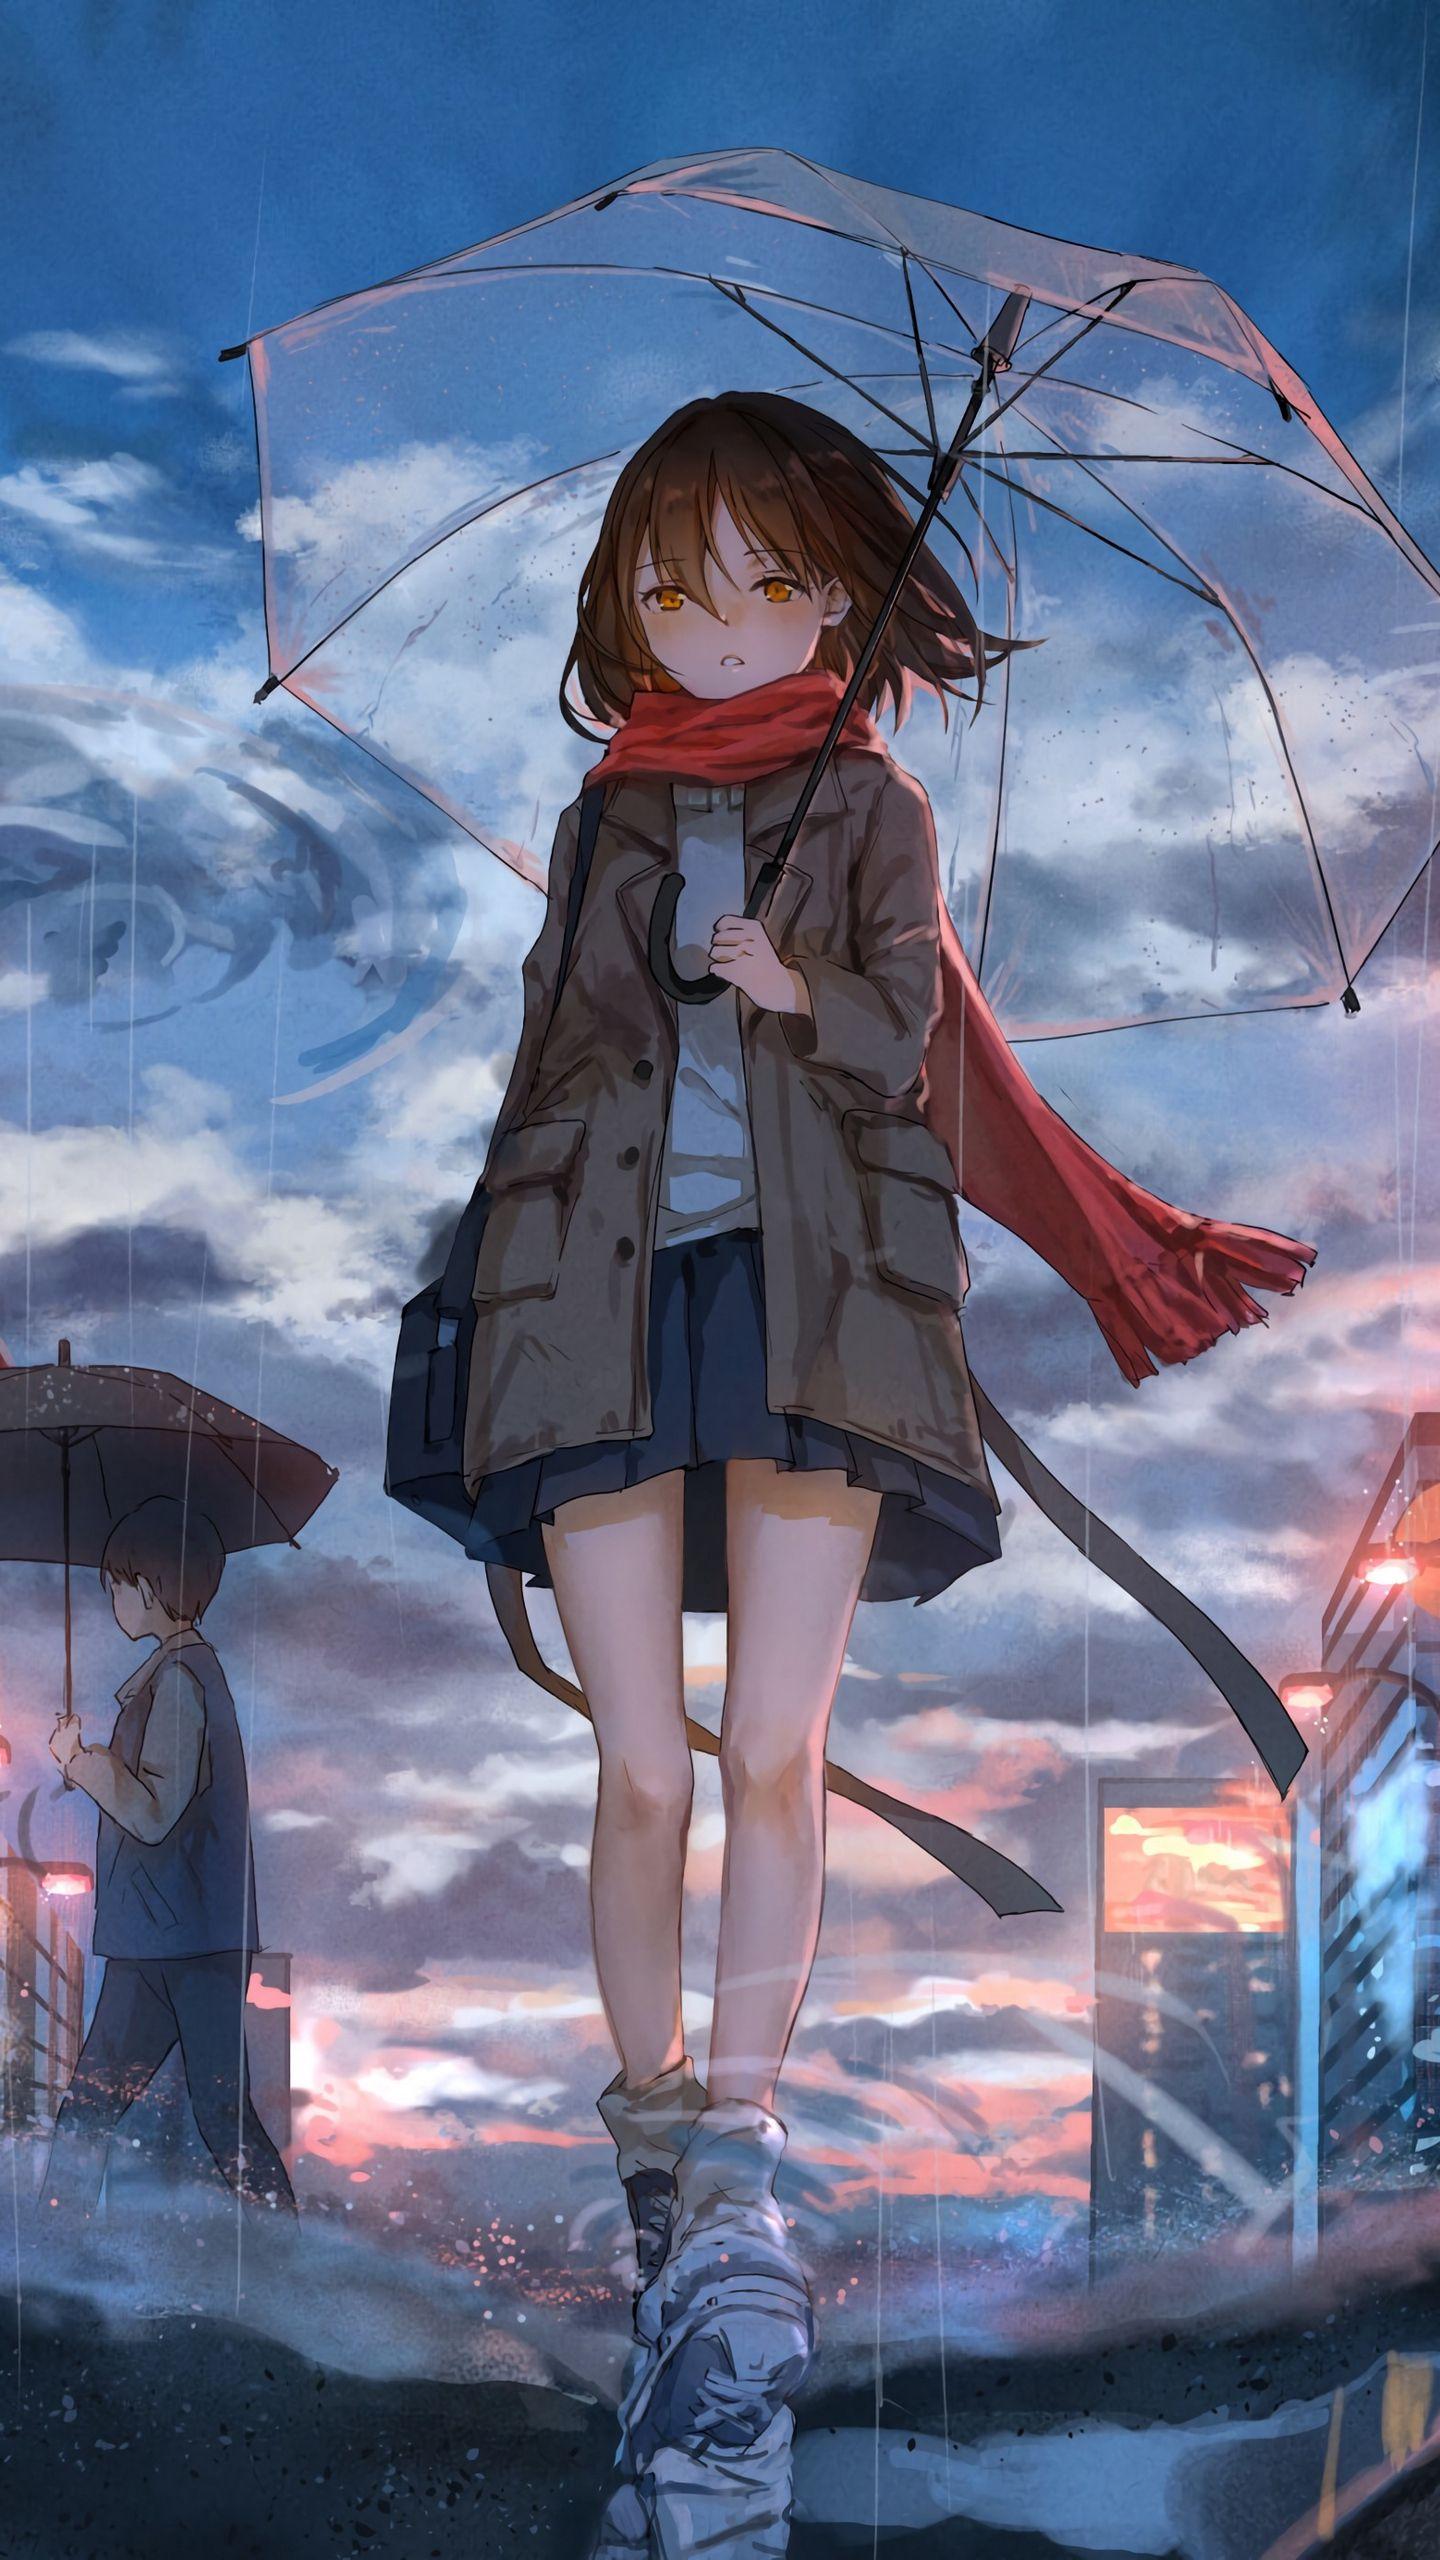 Pin Oleh Jae Di P A Anime Neko Gambar Anime Gadis Animasi